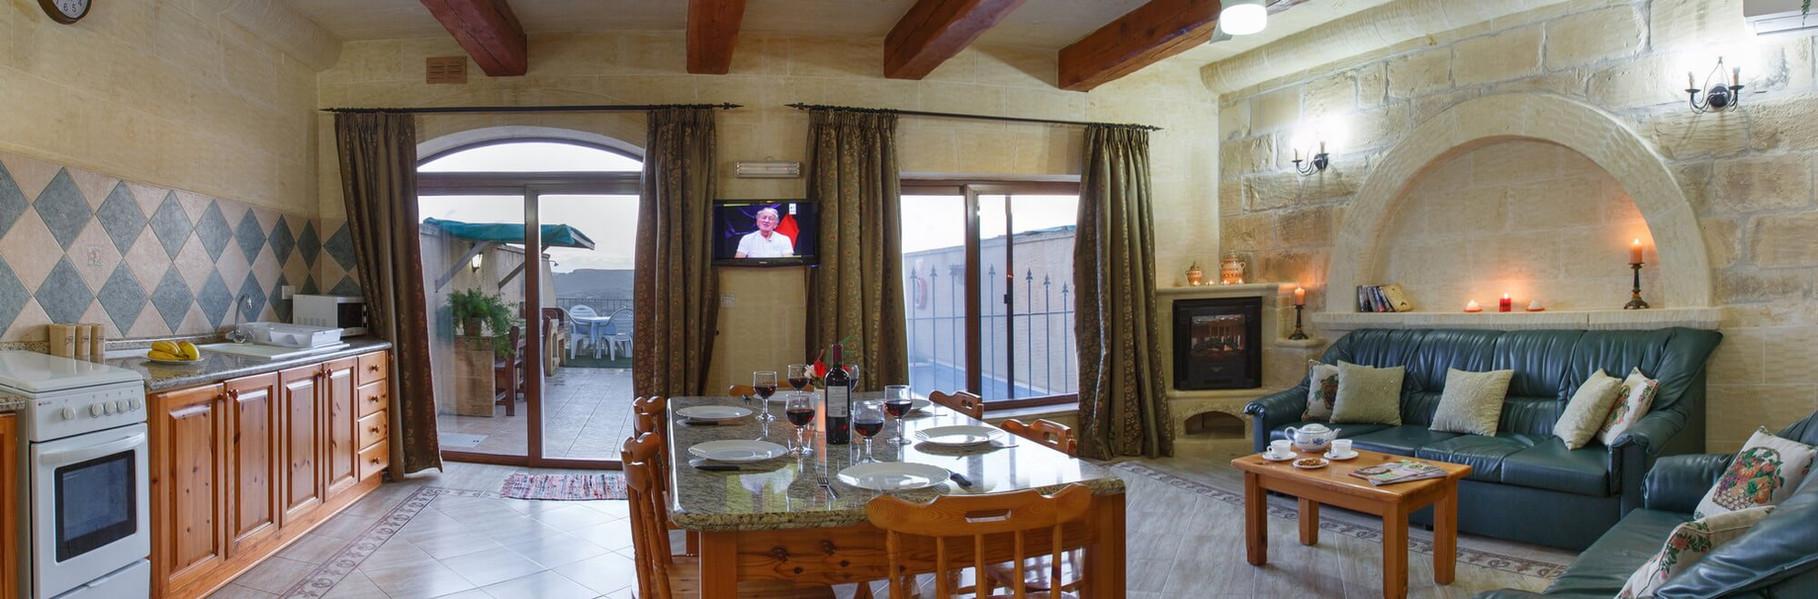 kitchen-dining-living-3dor.jpg